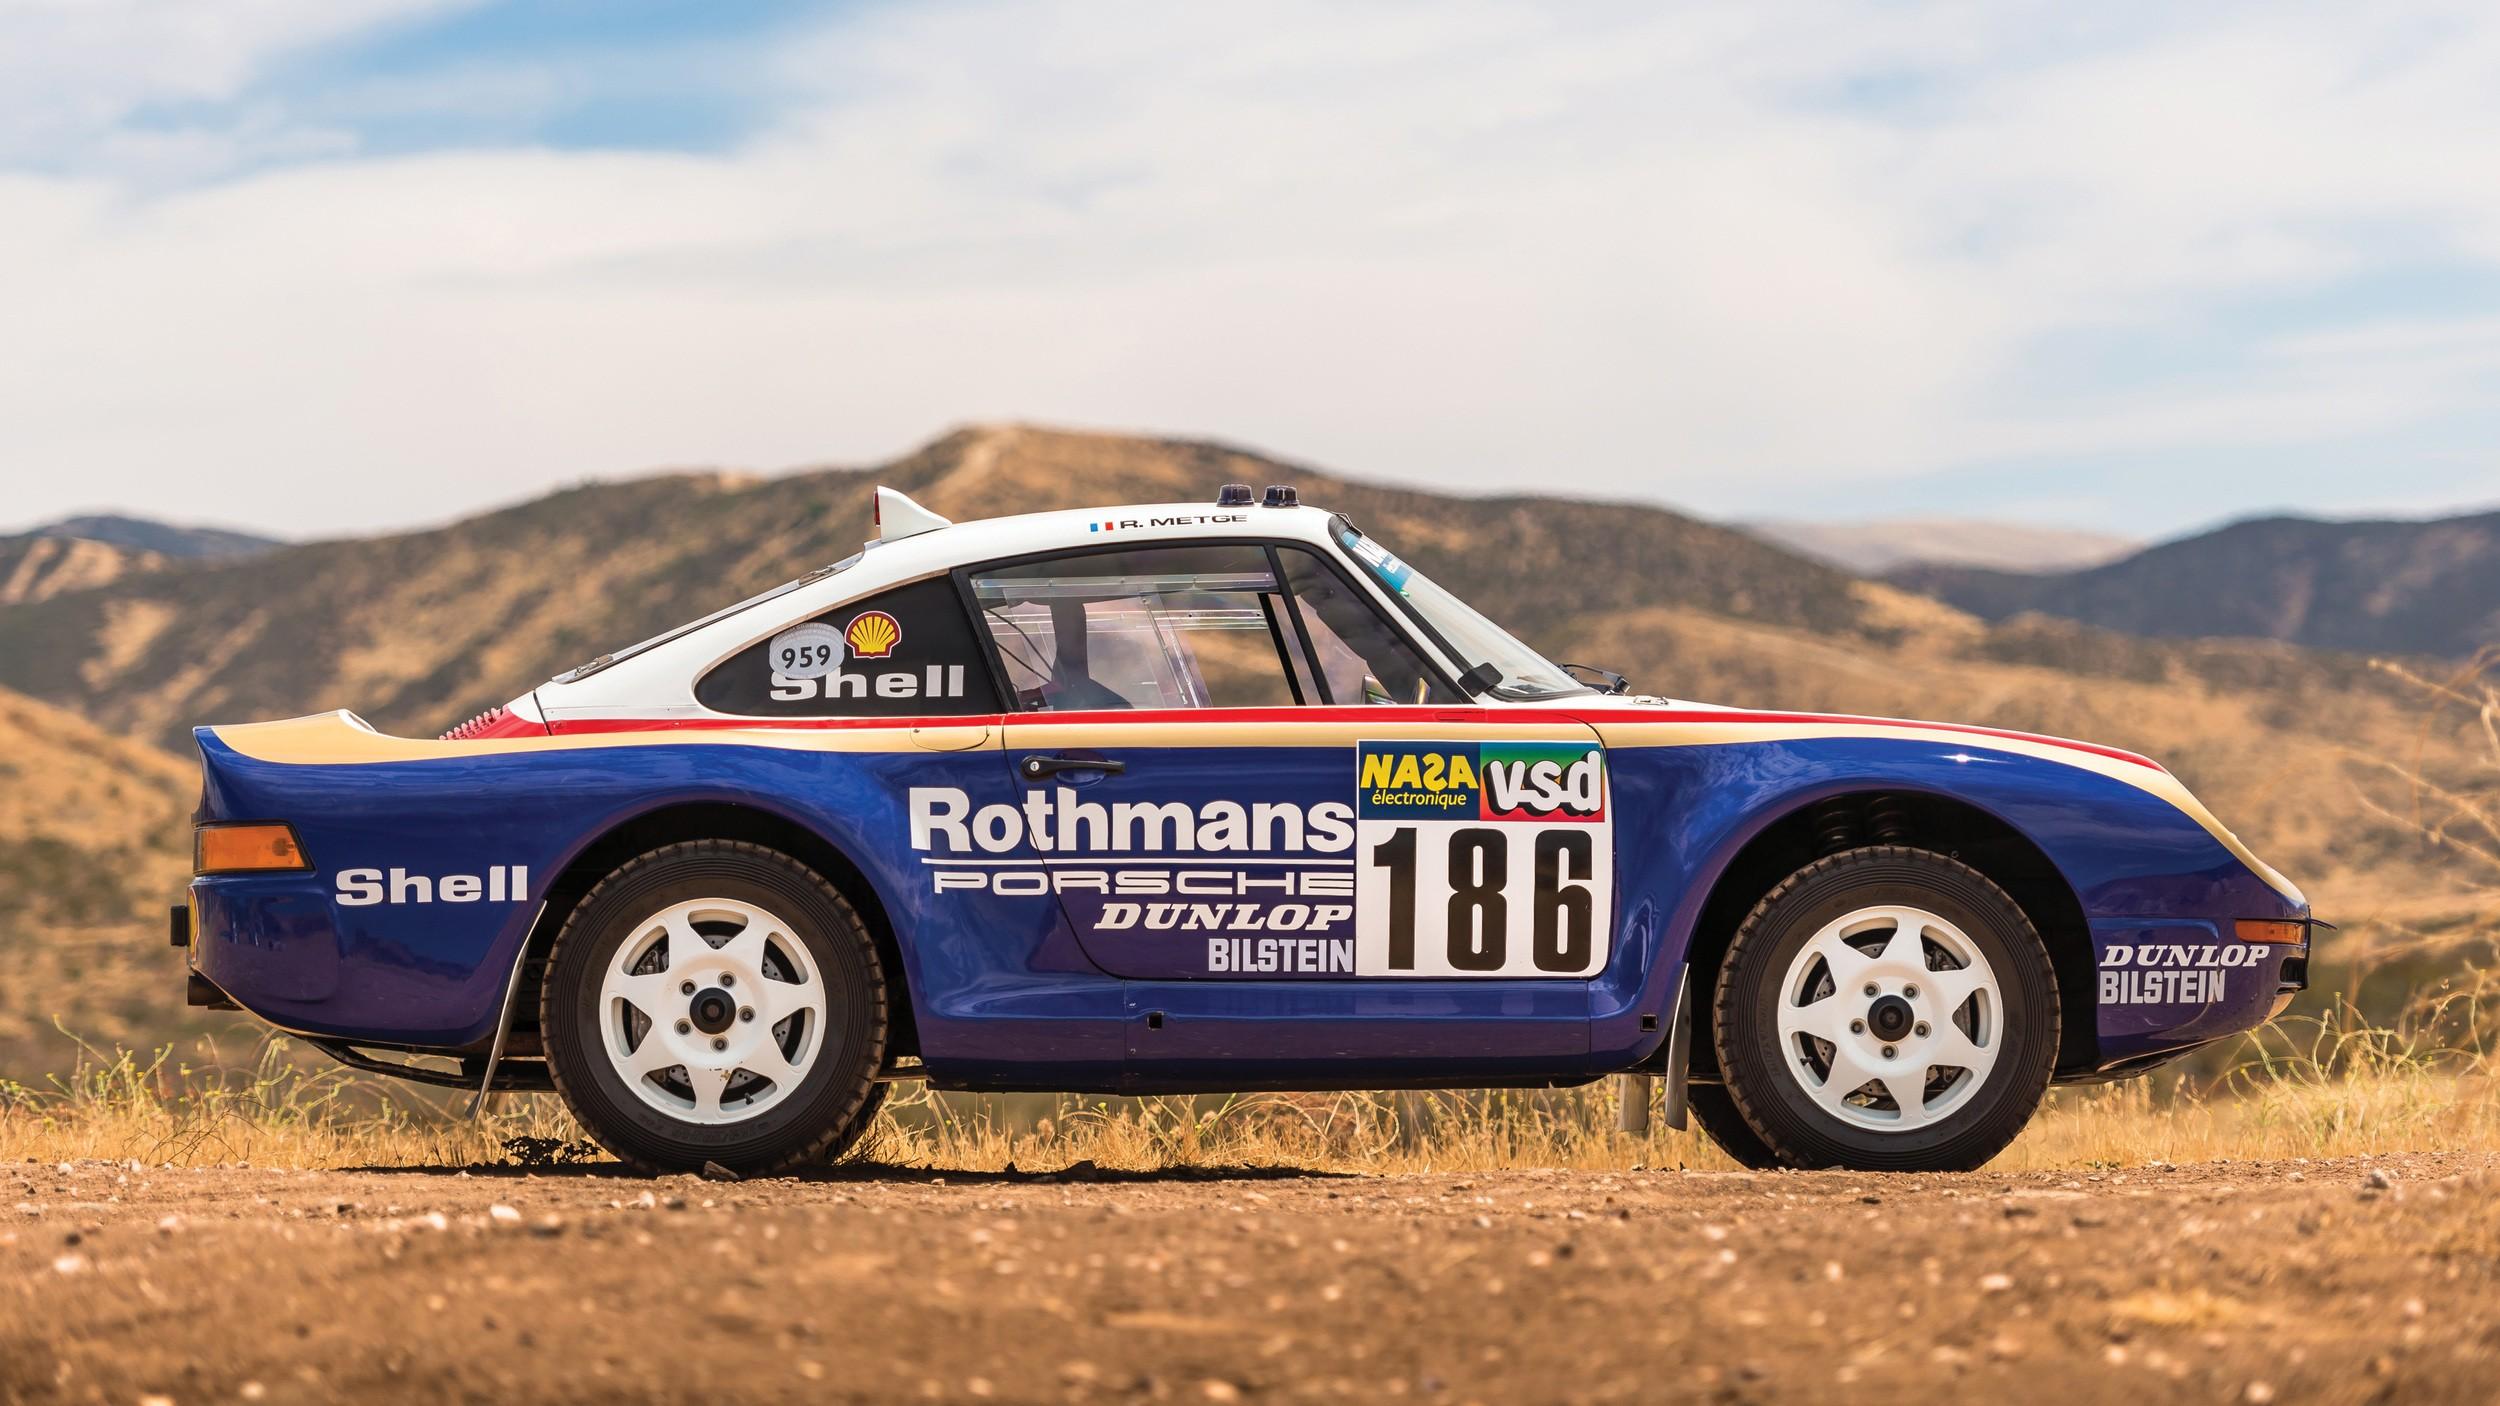 Two Legendary Porsche 959 Models Head To Auction